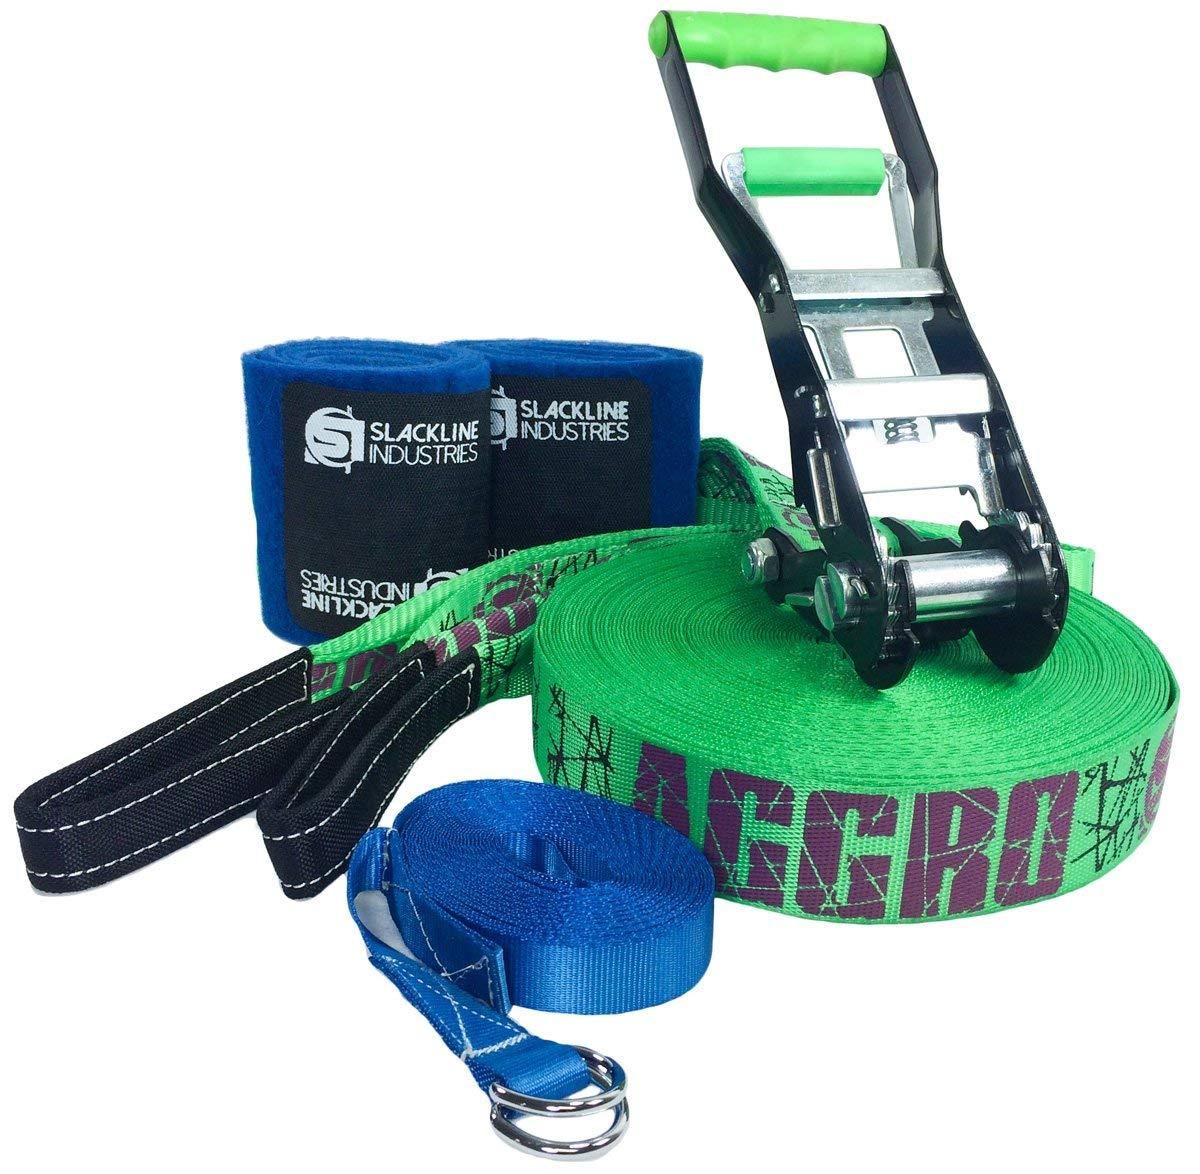 Slackline Industries Aggro Line Performance Trickline Kit